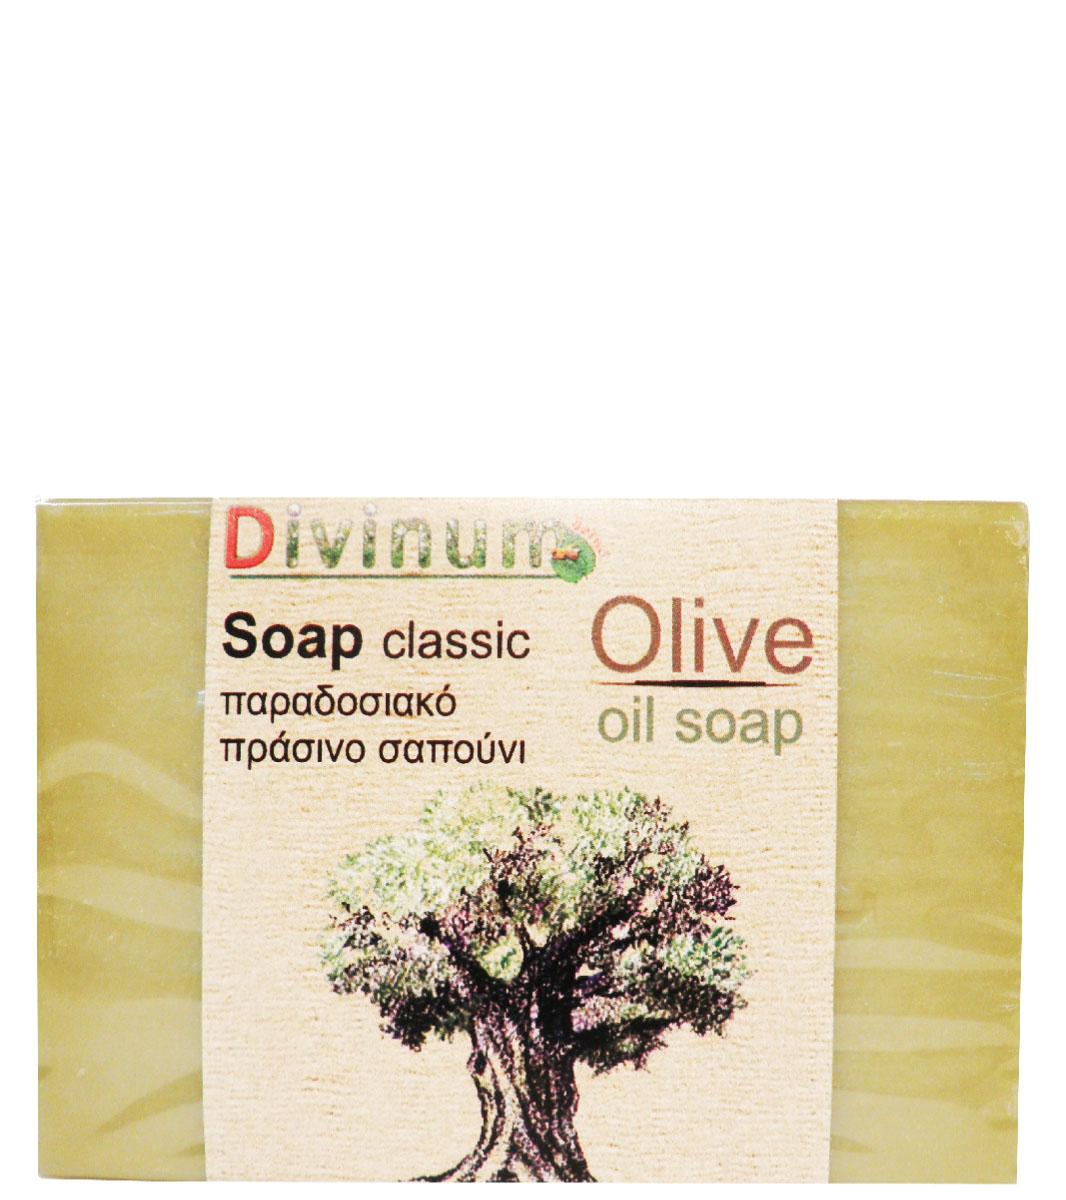 soapclassic